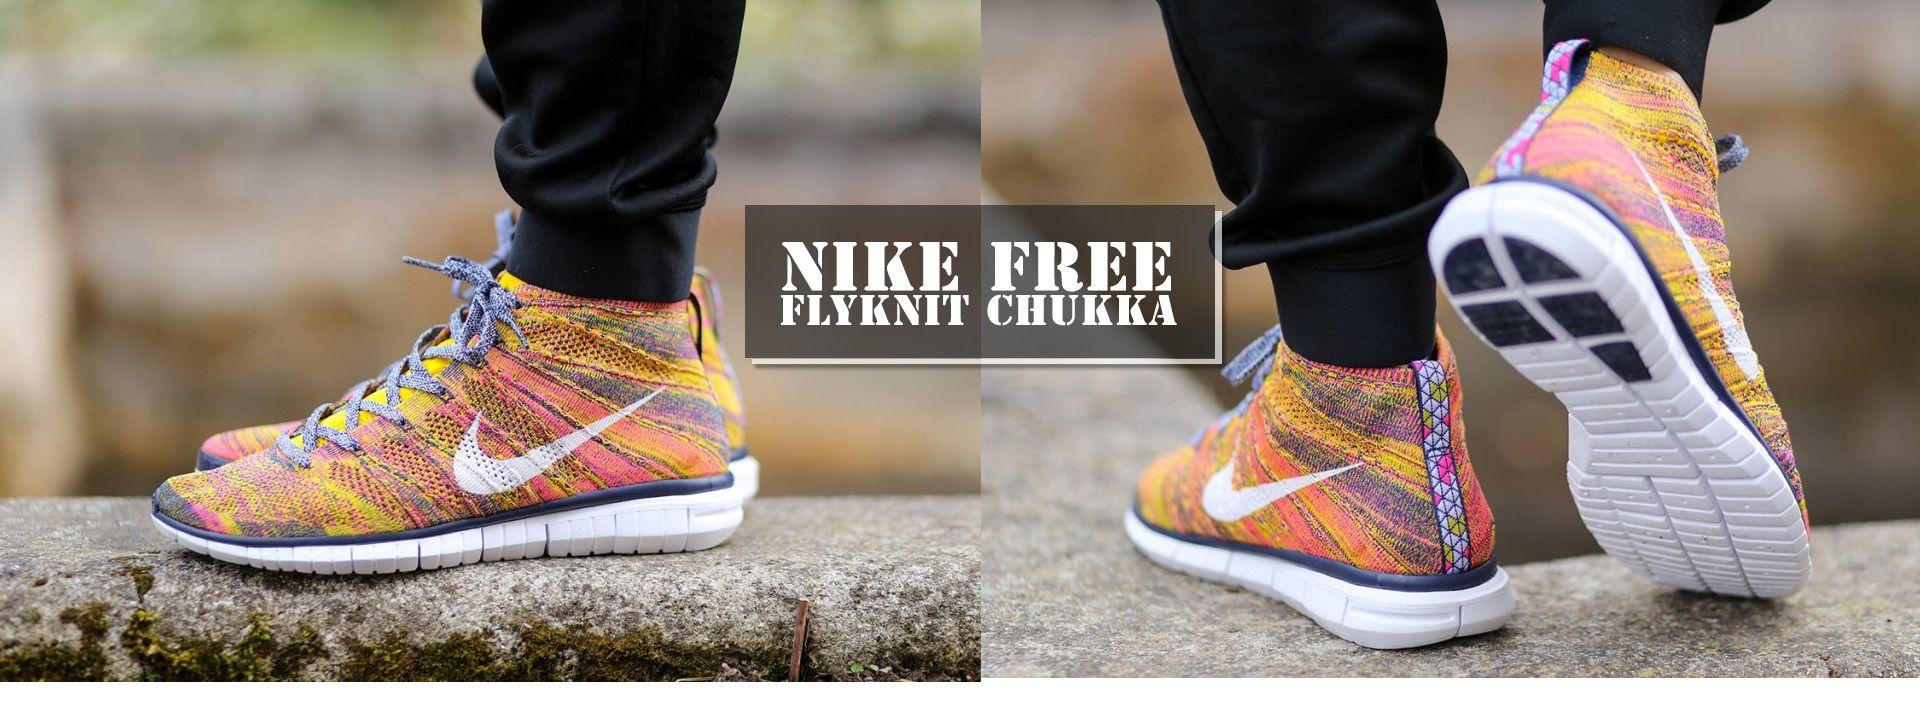 zapatillas running mujer ofertas nike